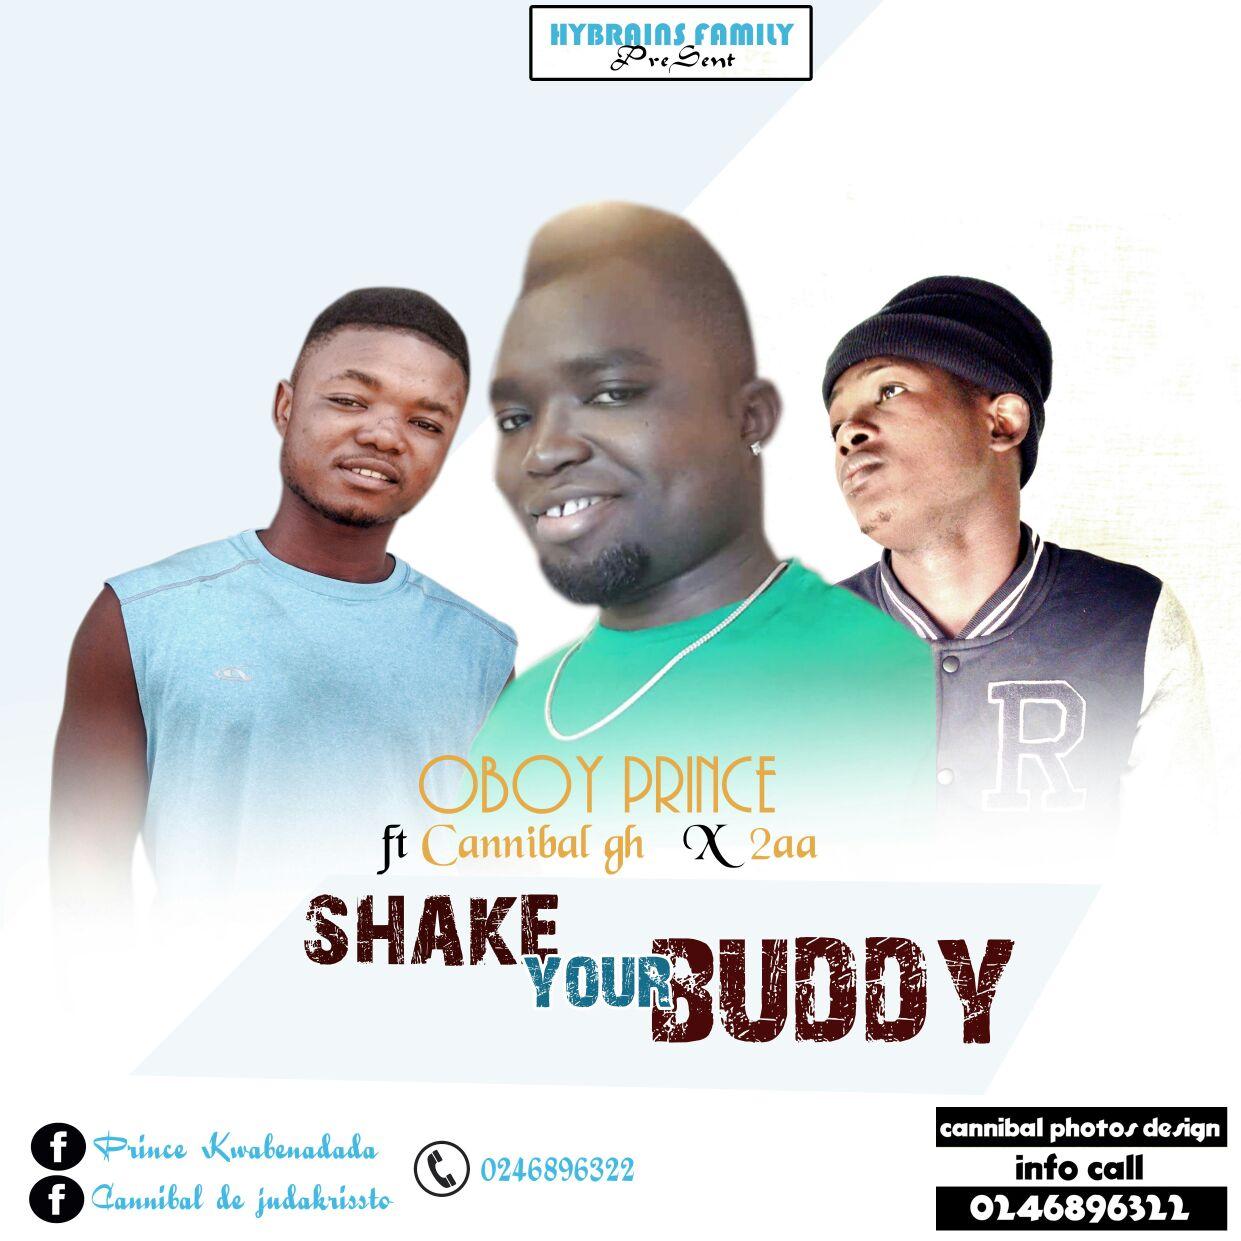 Oboy Prince Shake Your Buddy Ft